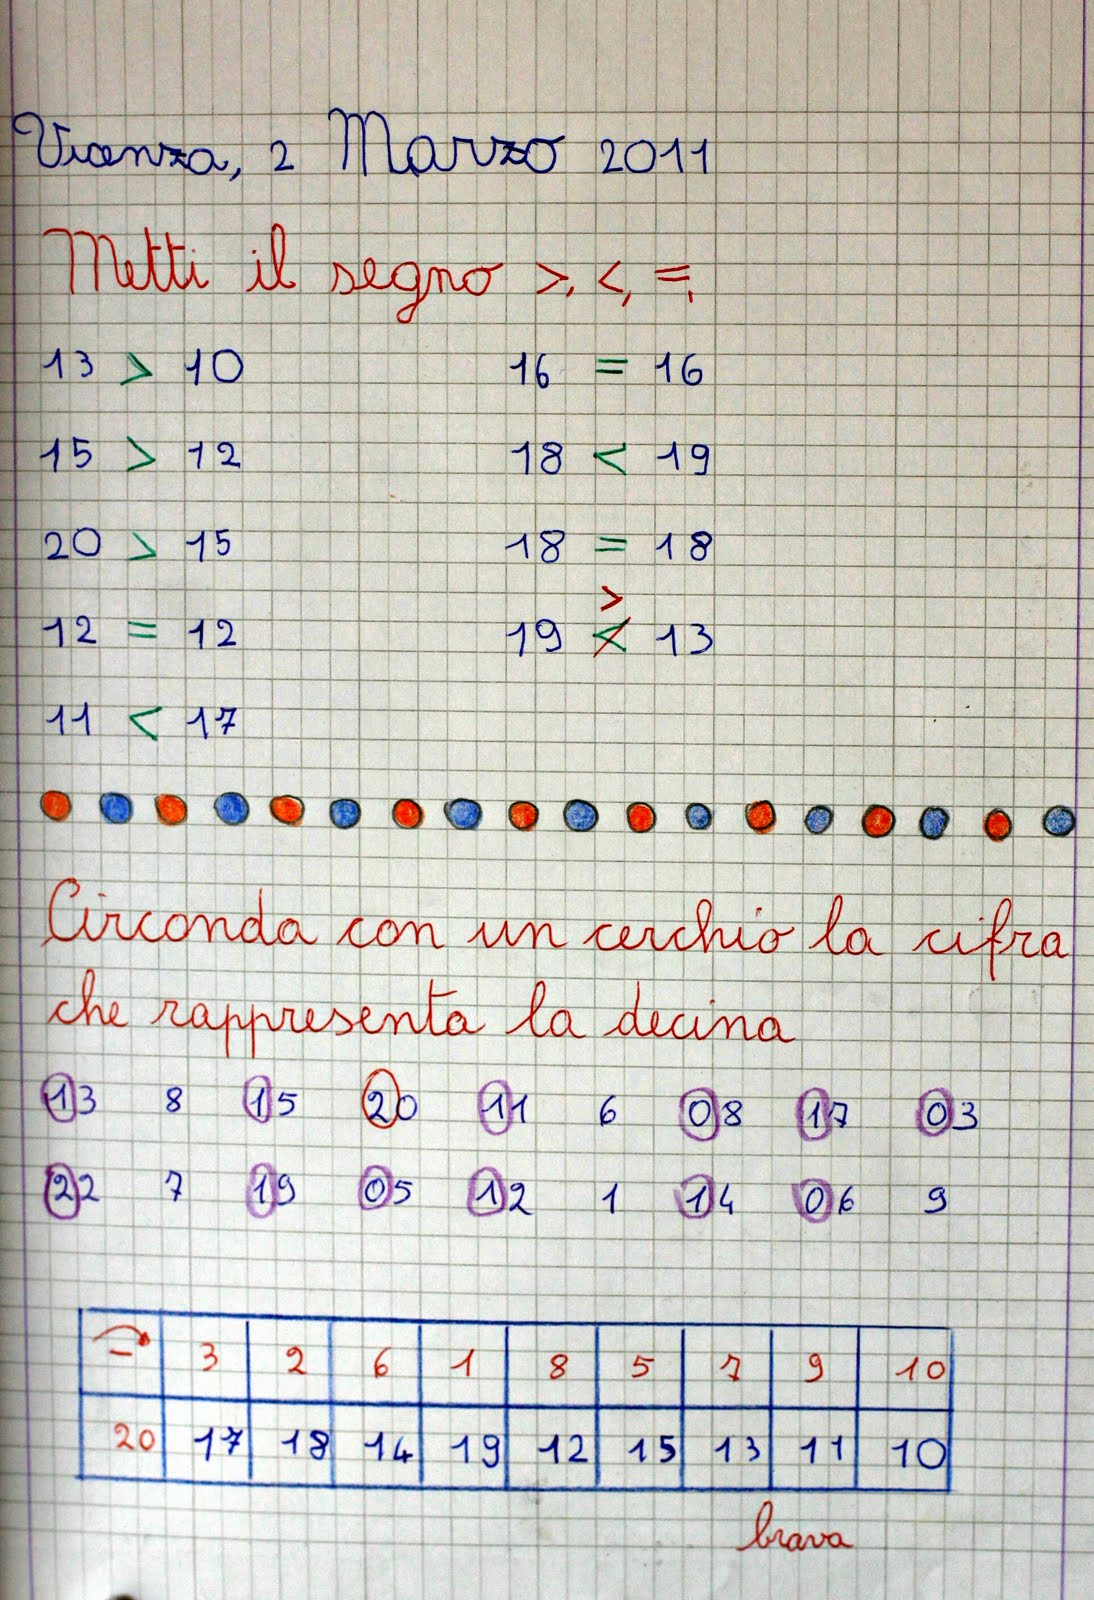 3ingiro Education Artifact Mathematics Notebook